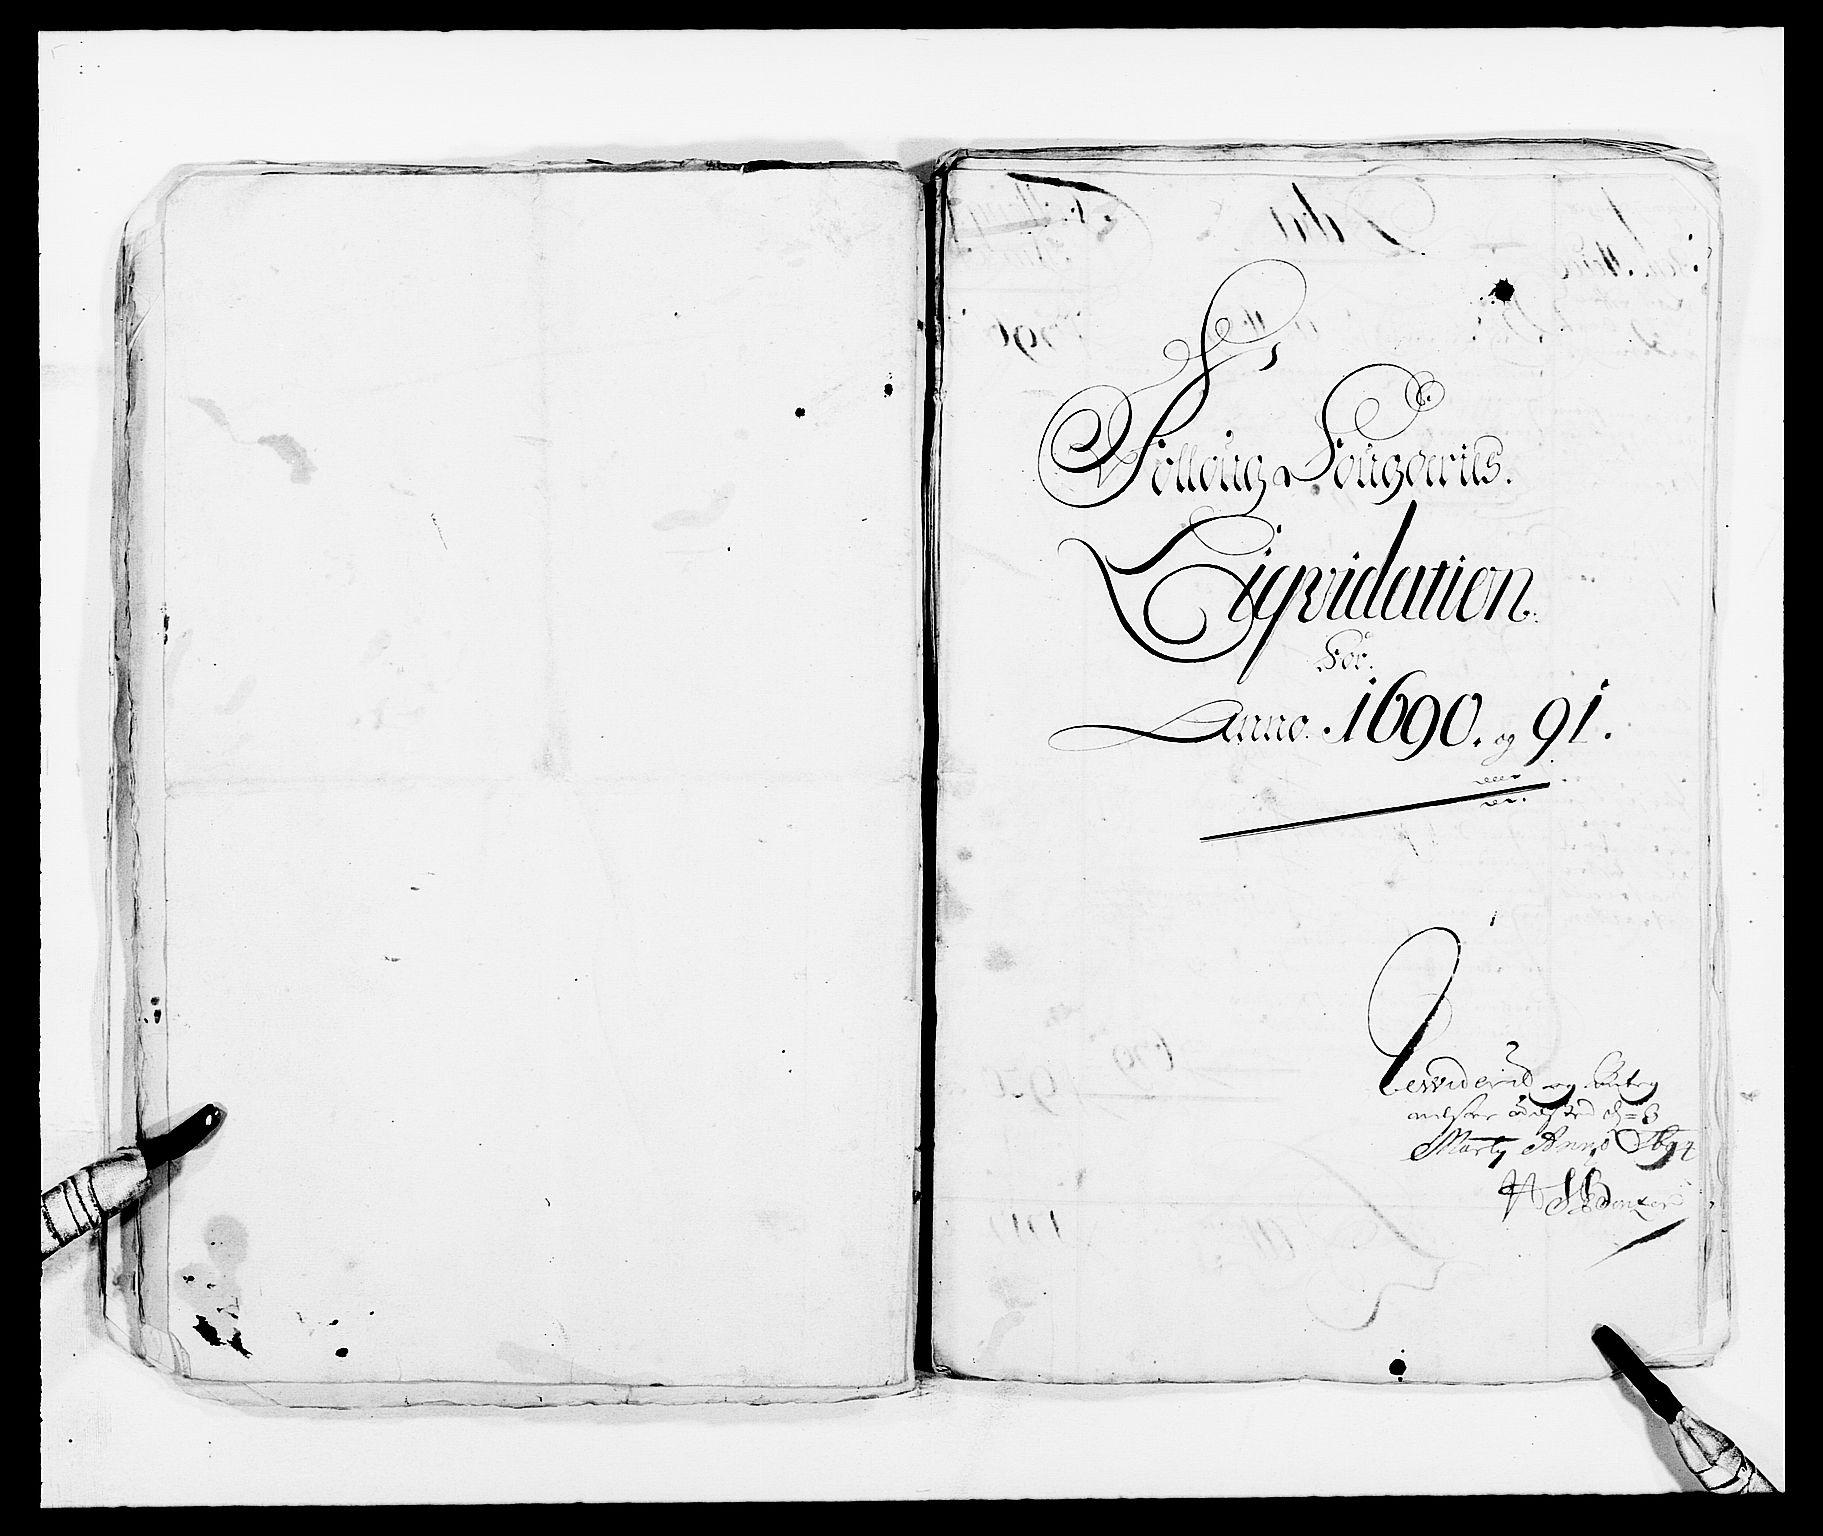 RA, Rentekammeret inntil 1814, Reviderte regnskaper, Fogderegnskap, R09/L0436: Fogderegnskap Follo, 1685-1691, s. 26